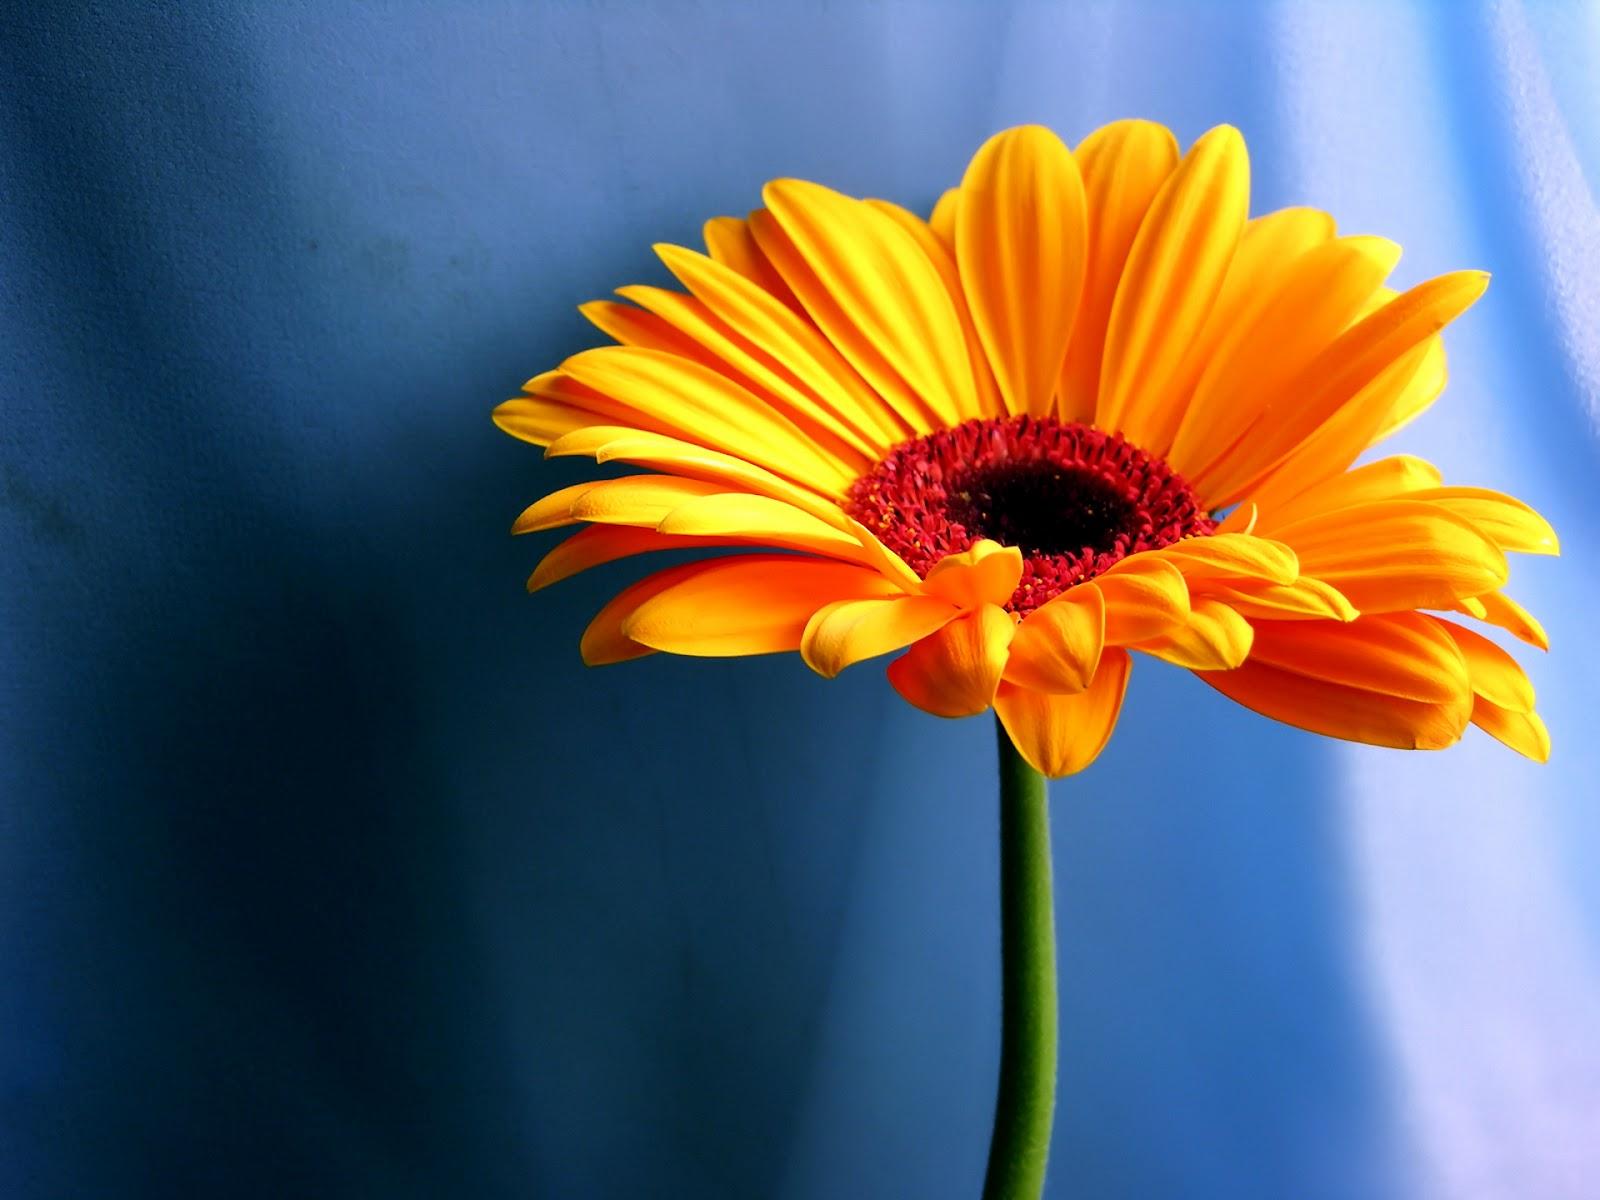 flowers for flower lovers daisy flowers desktop wallpapers